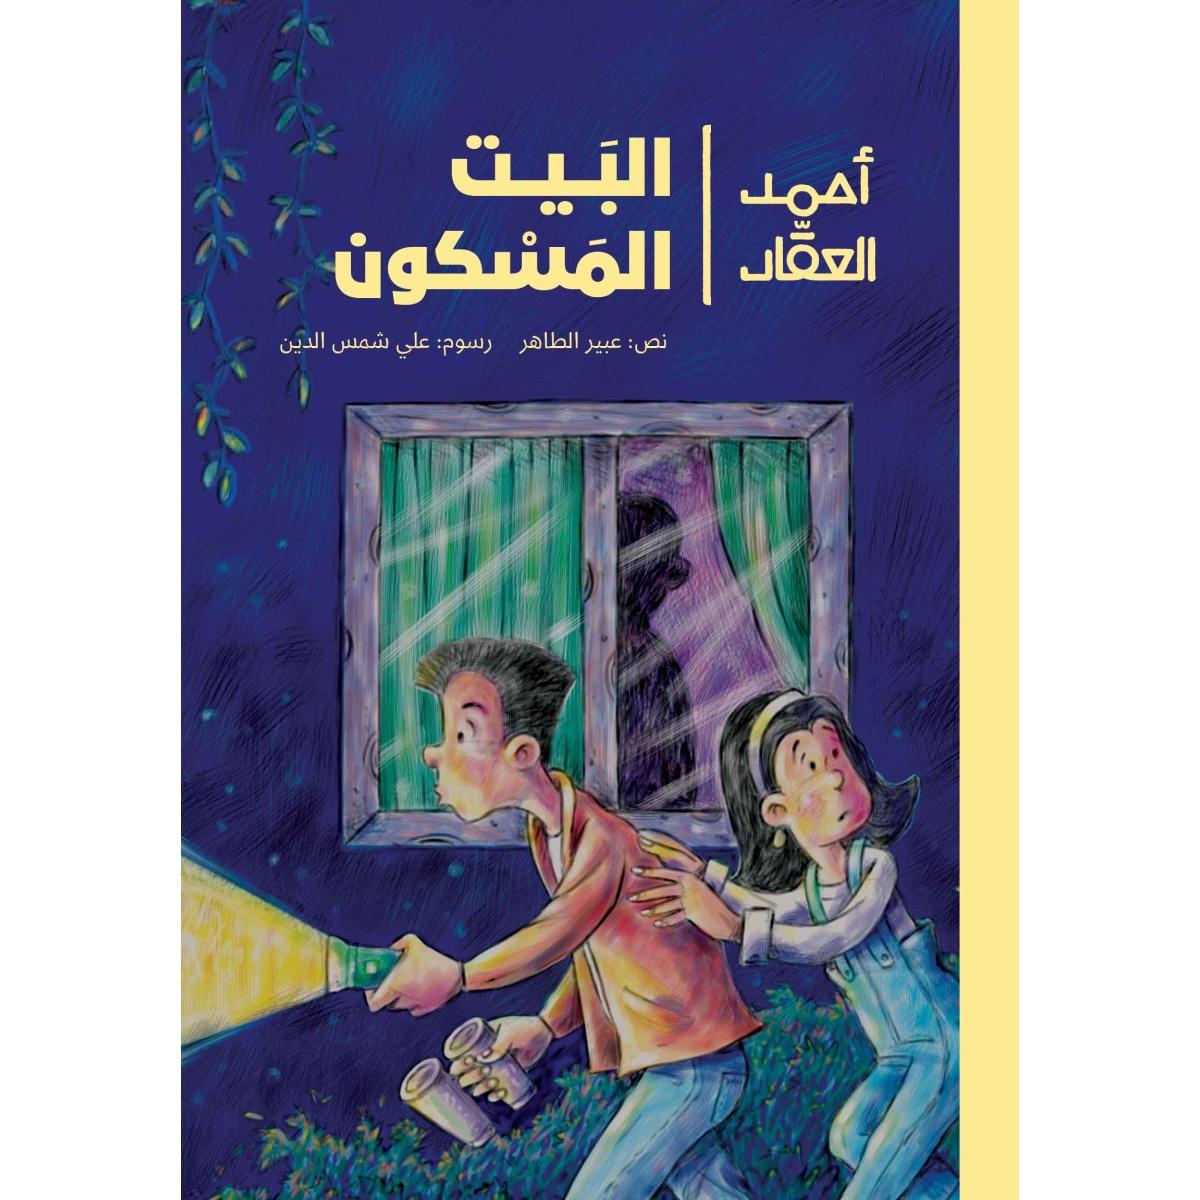 Ahmad Akkad-The Haunted House Cover